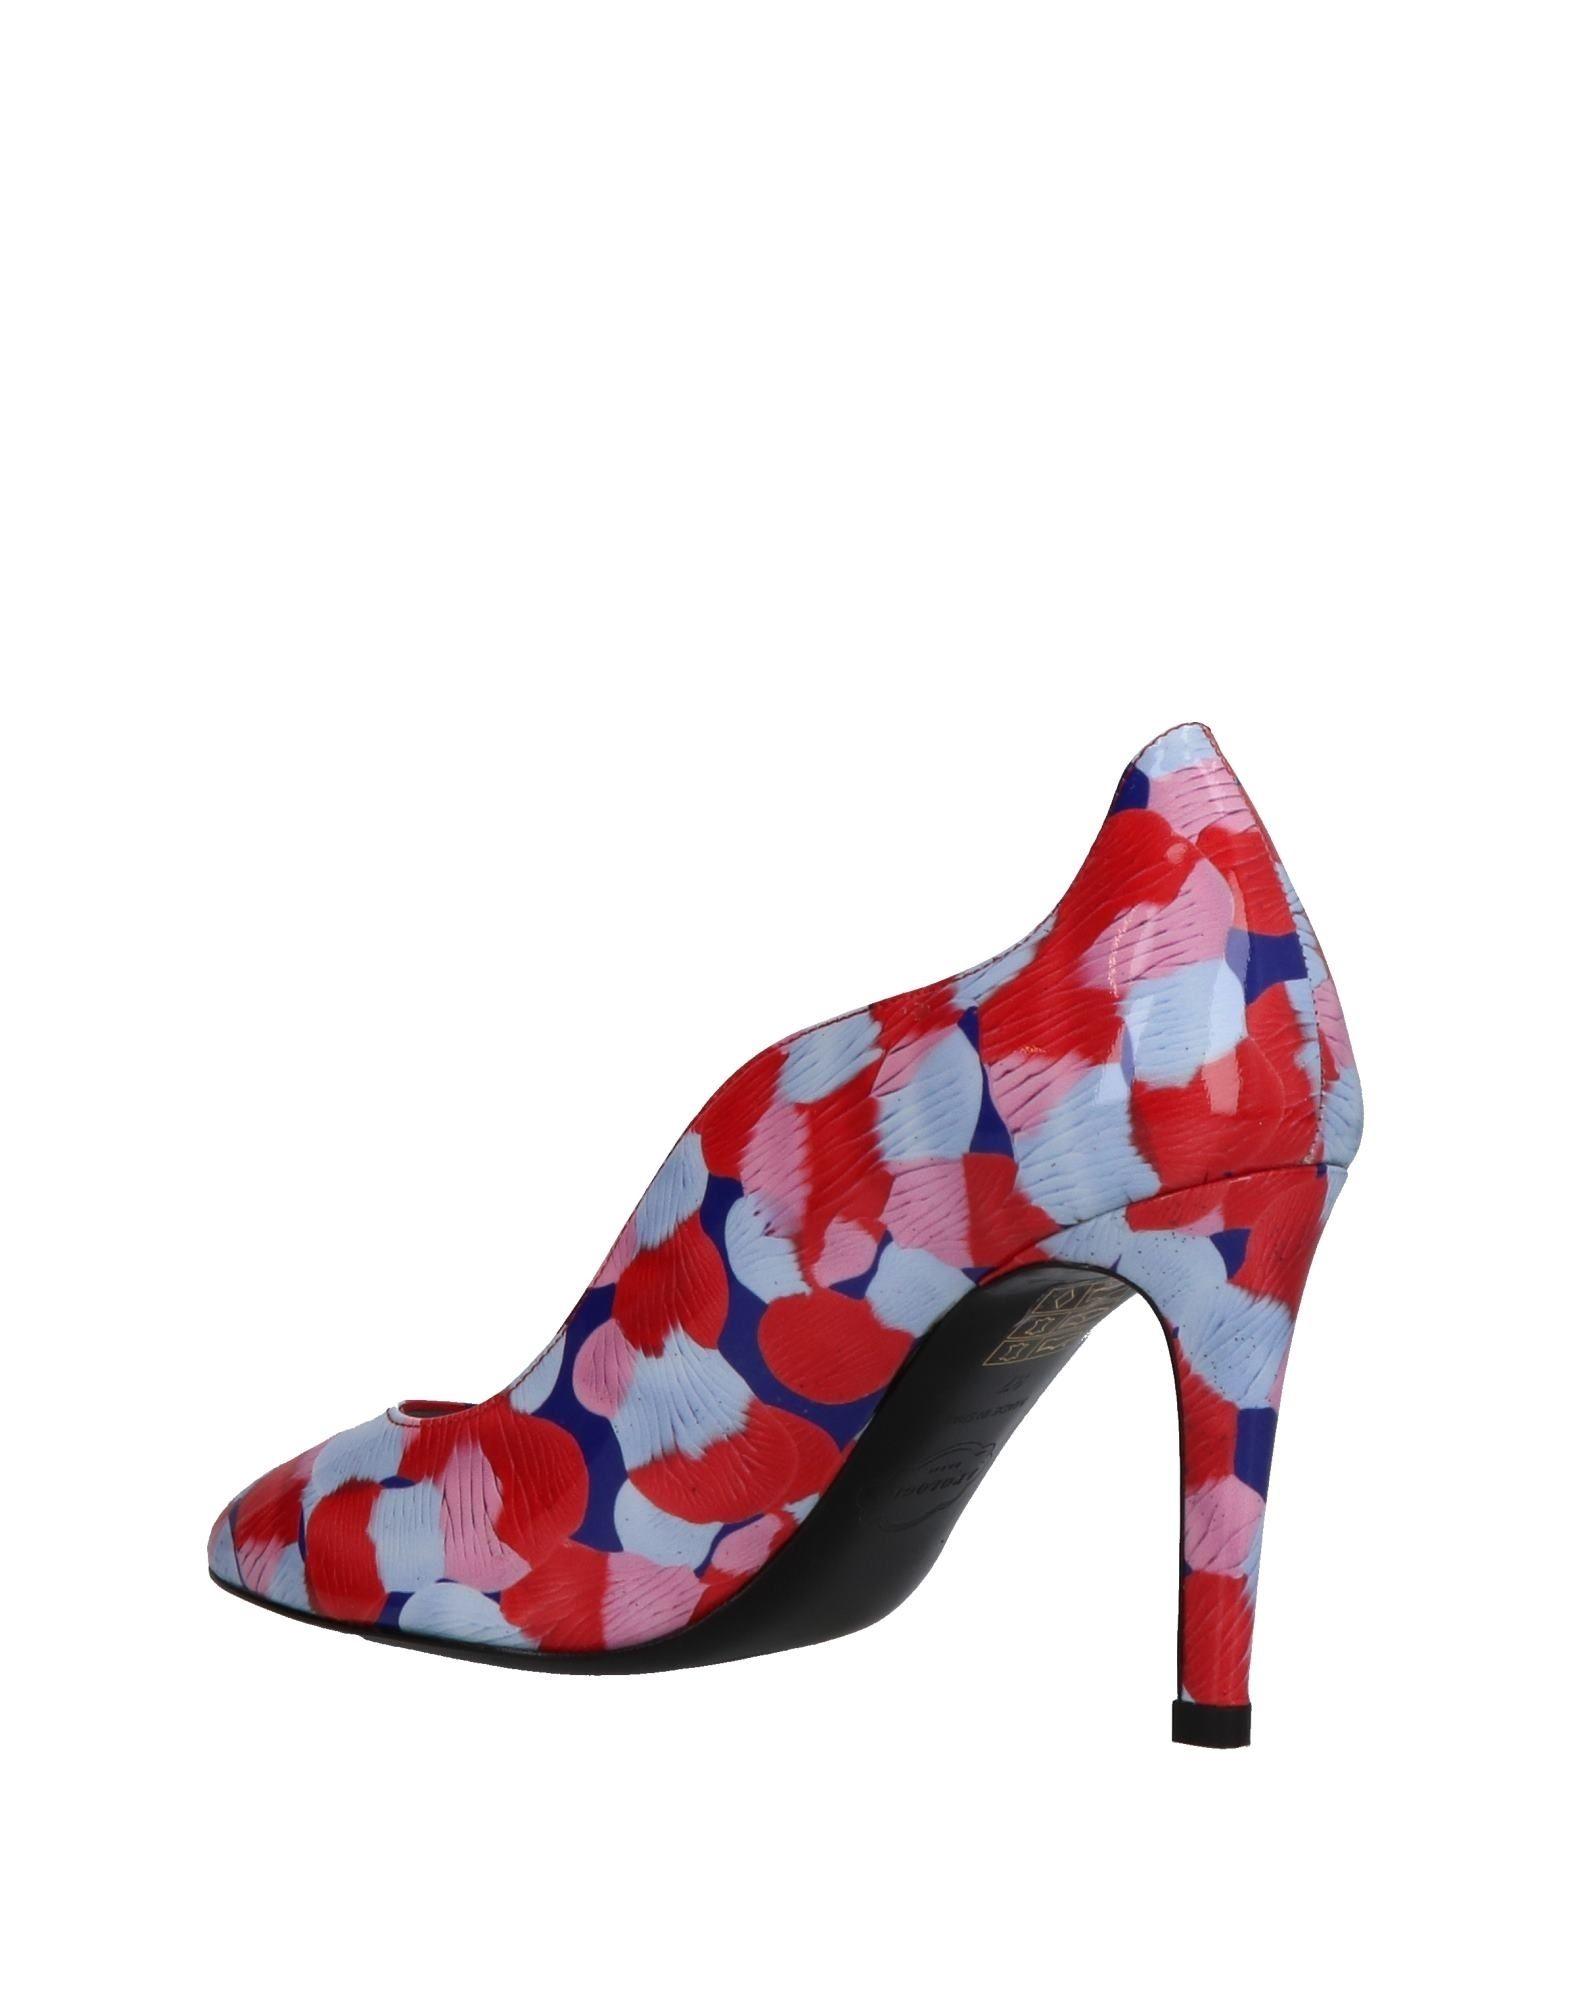 Apologie Pumps Damen  11332235EP Gute Qualität beliebte Schuhe